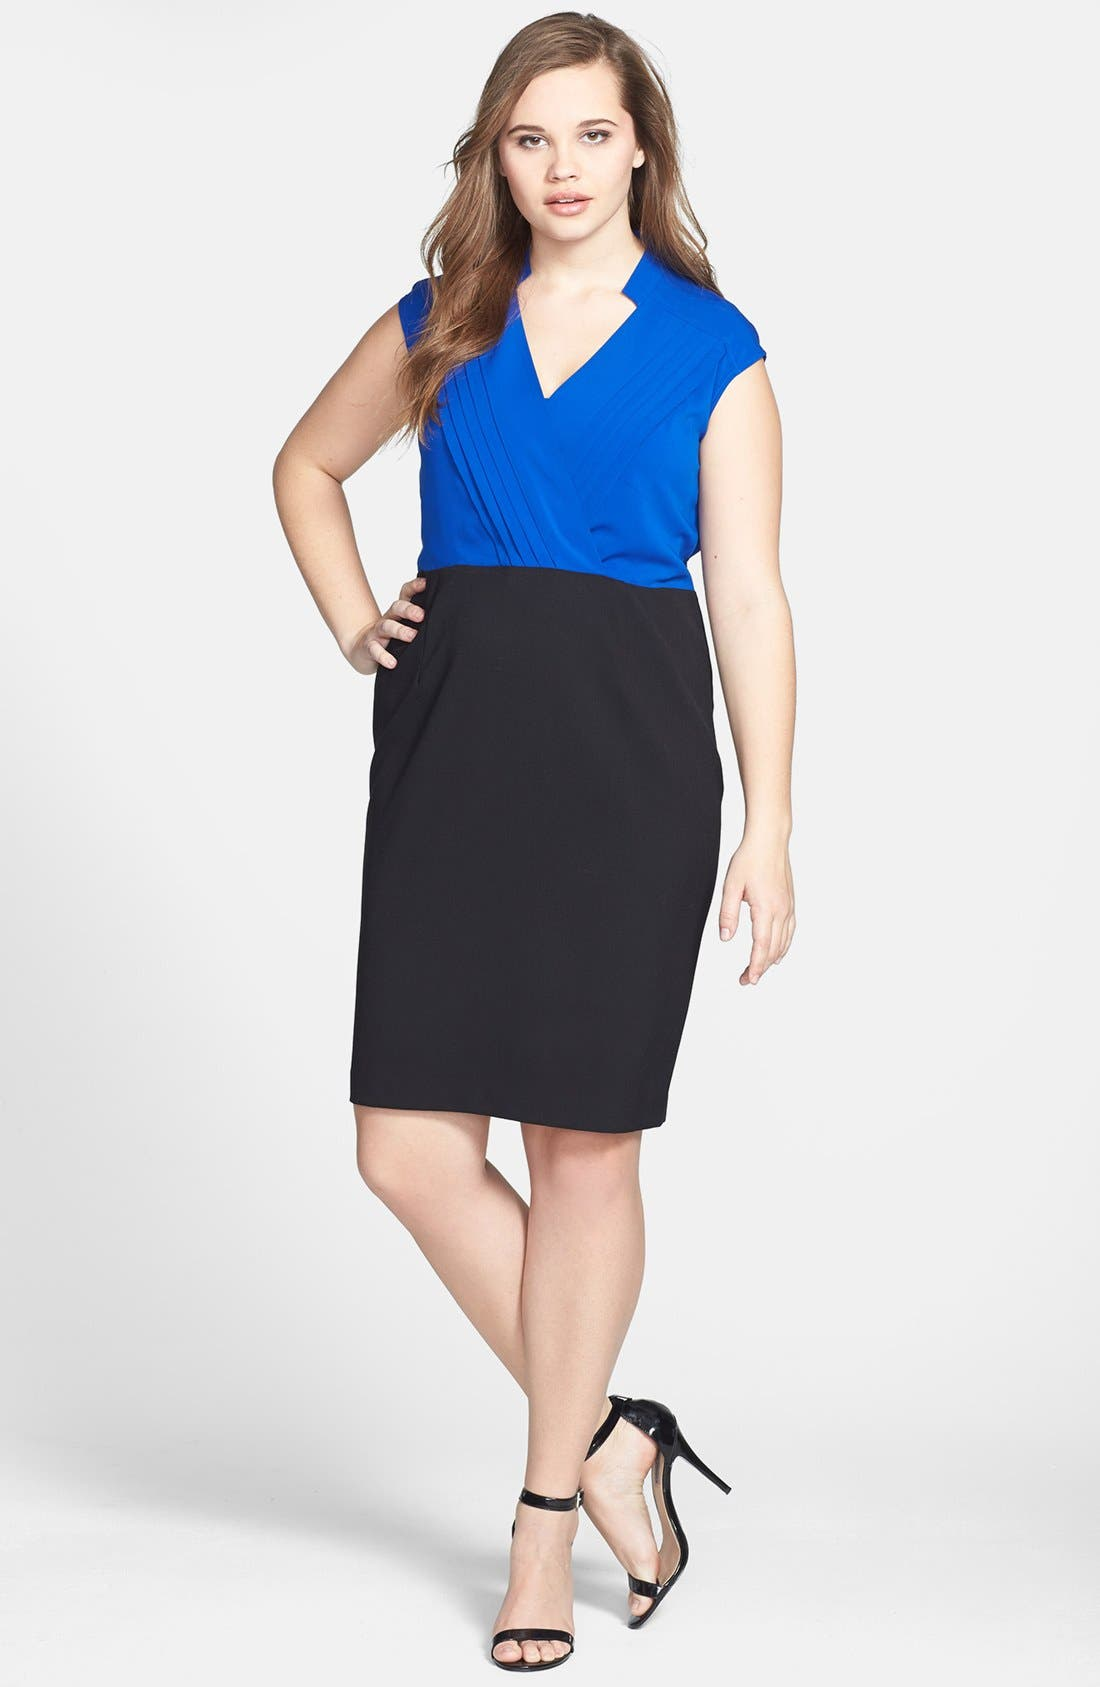 Alternate Image 1 Selected - Calvin Klein Cap Sleeve Colorblock Dress (Plus Size)